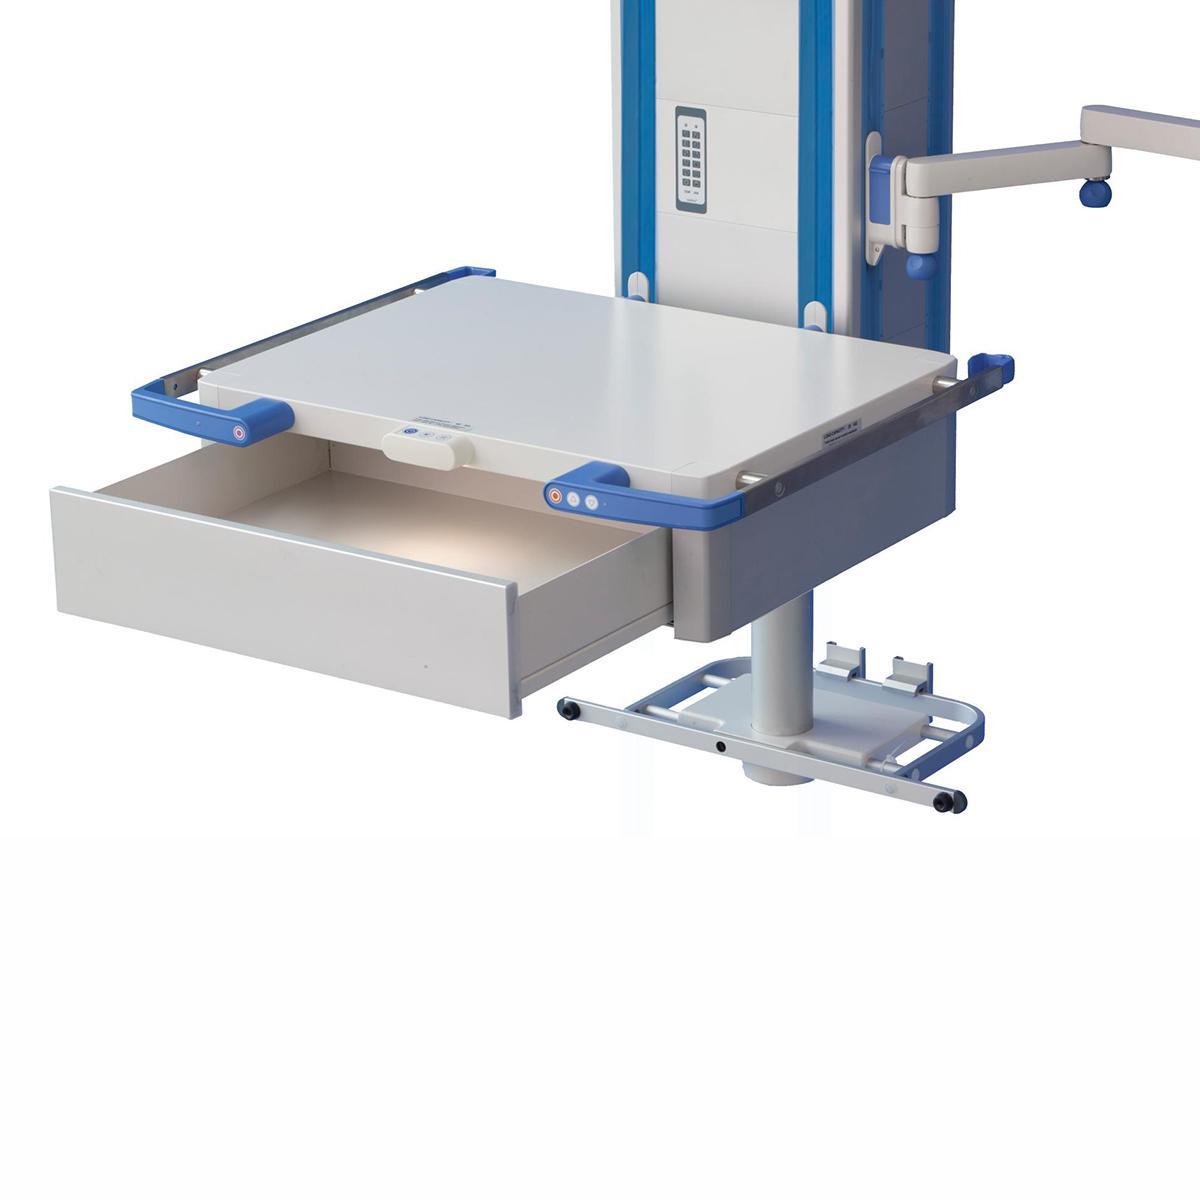 Bras articulé FCS, tiroir/tablette